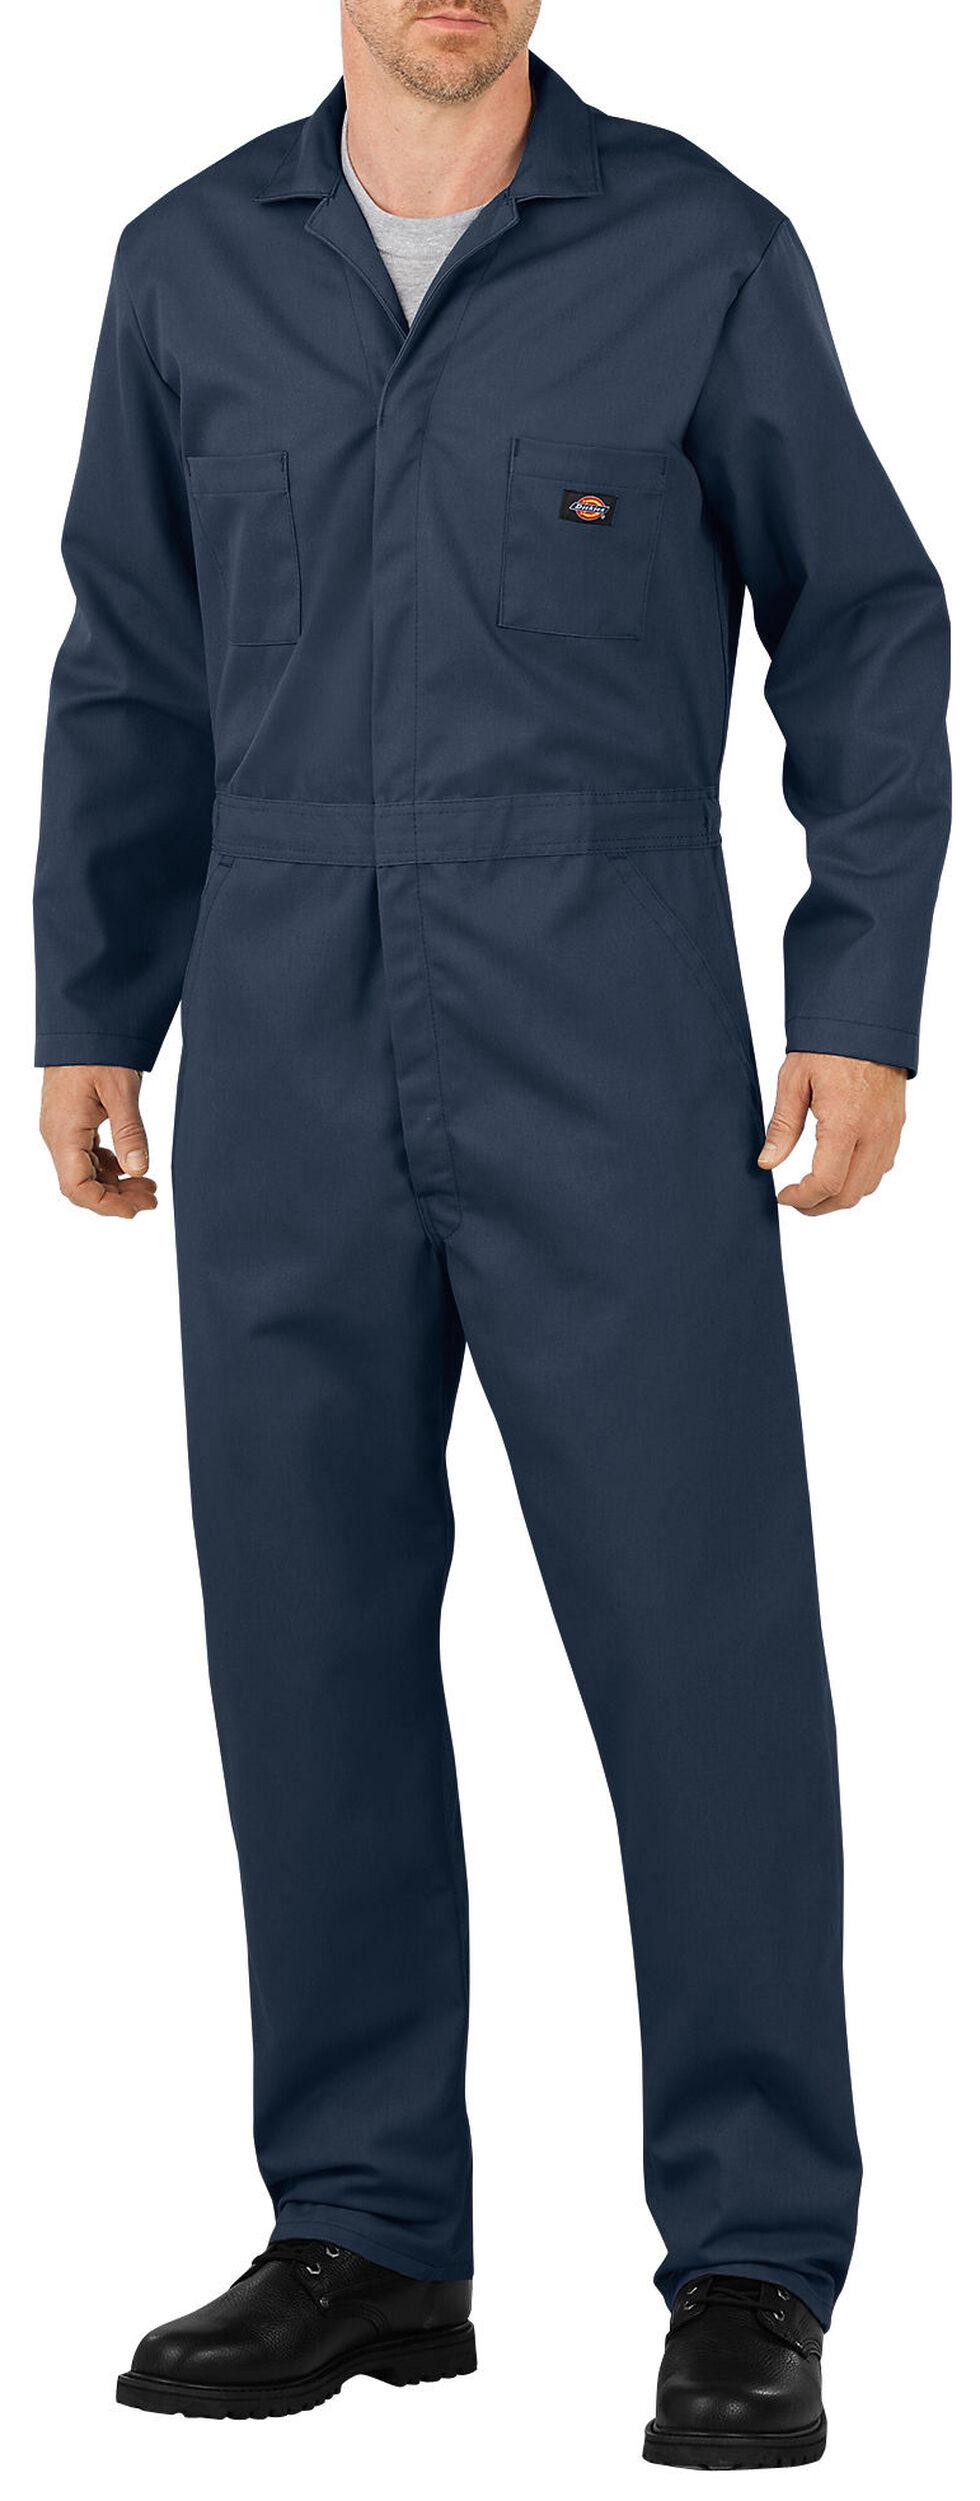 Dickies Long Sleeve Coveralls - Big & Tall, Dark Blue, hi-res